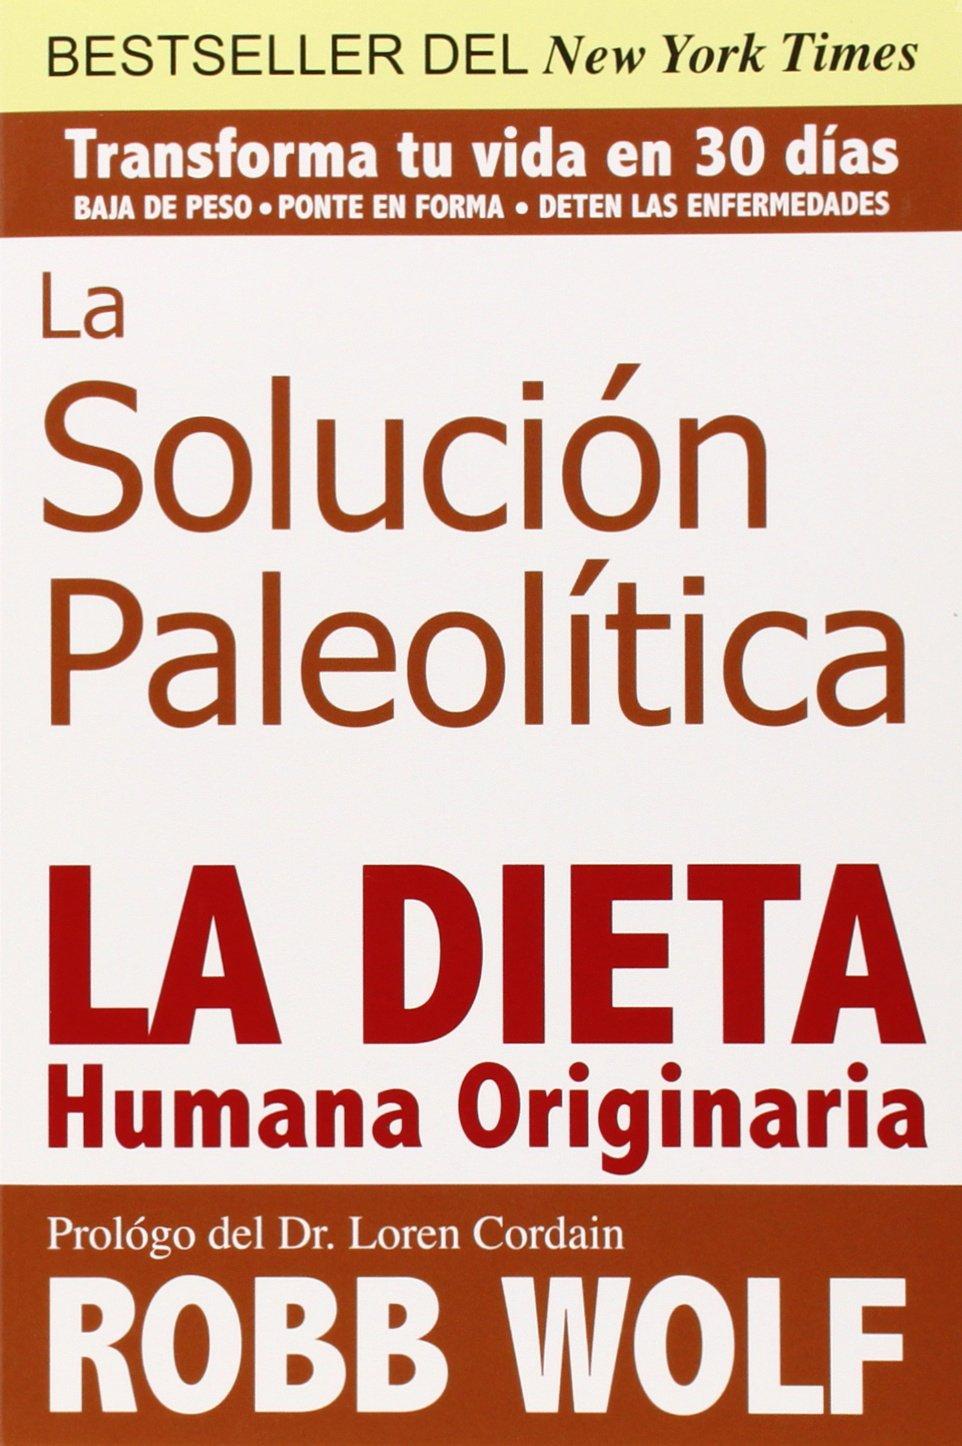 La Solucion Paleolitica: La Dieta Humana Originaria: Amazon ...